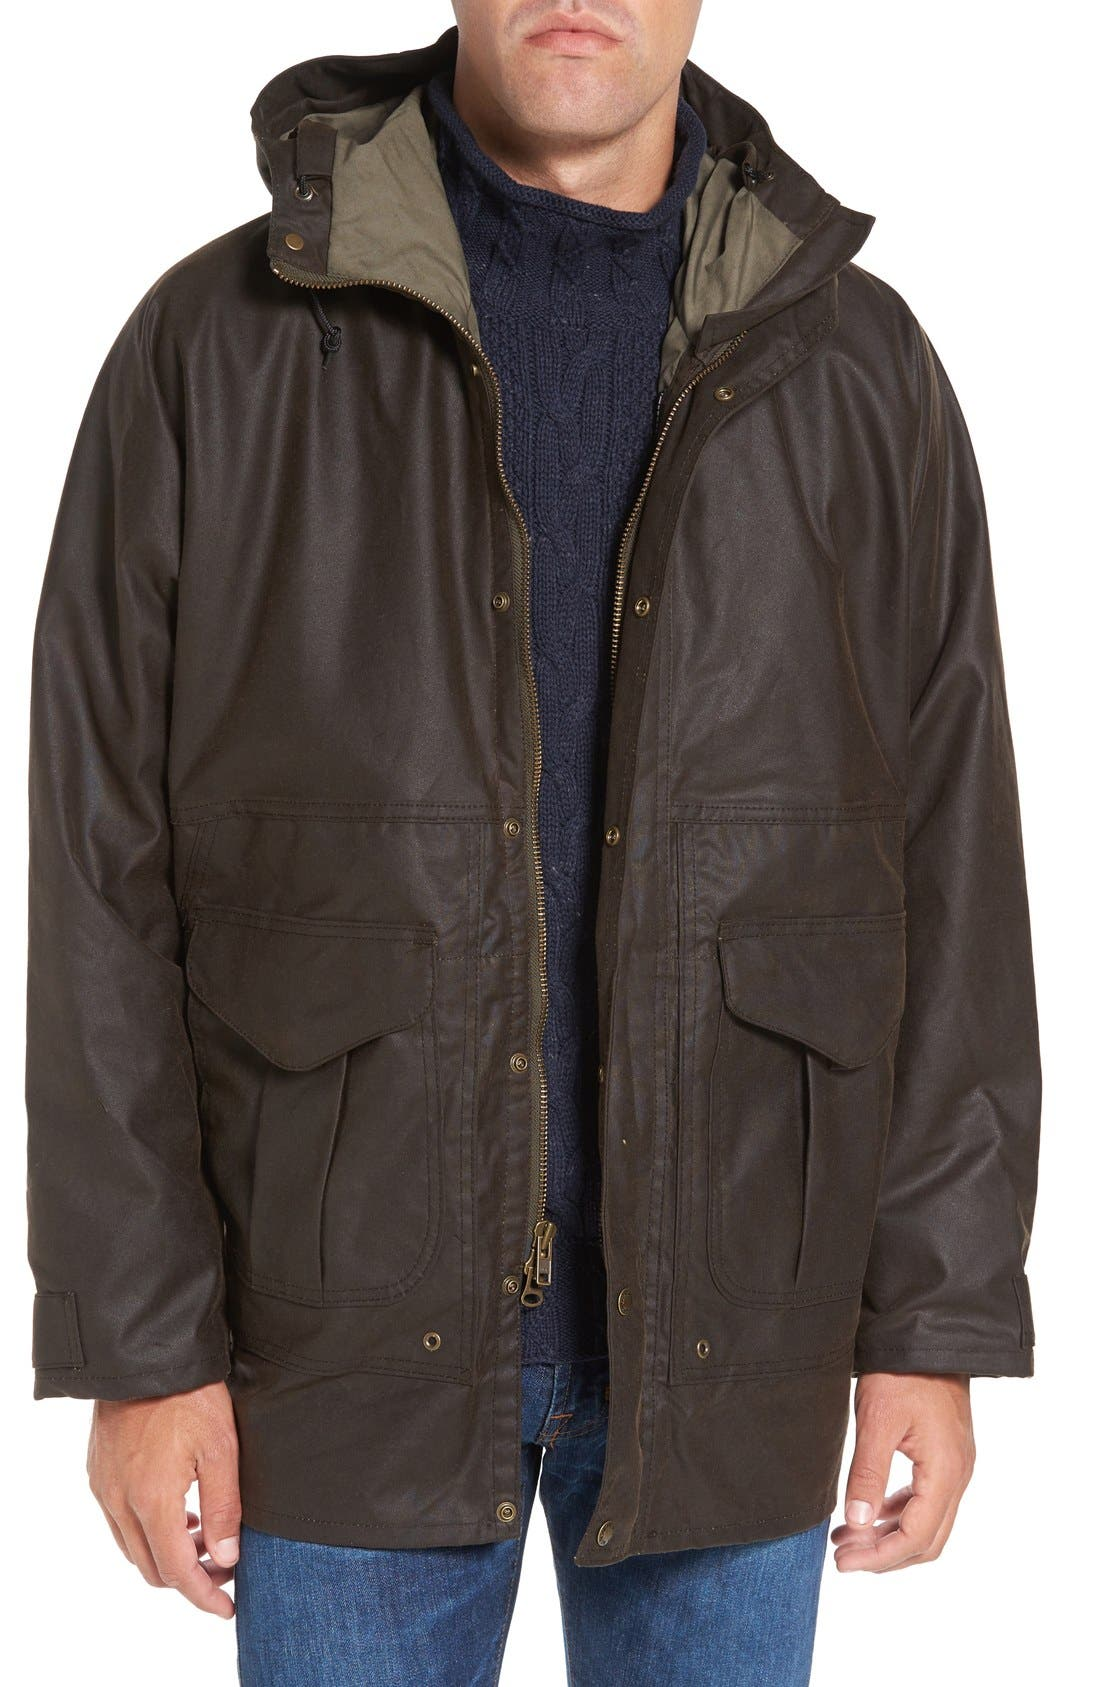 Filson All-Season Waterproof Hooded Raincoat